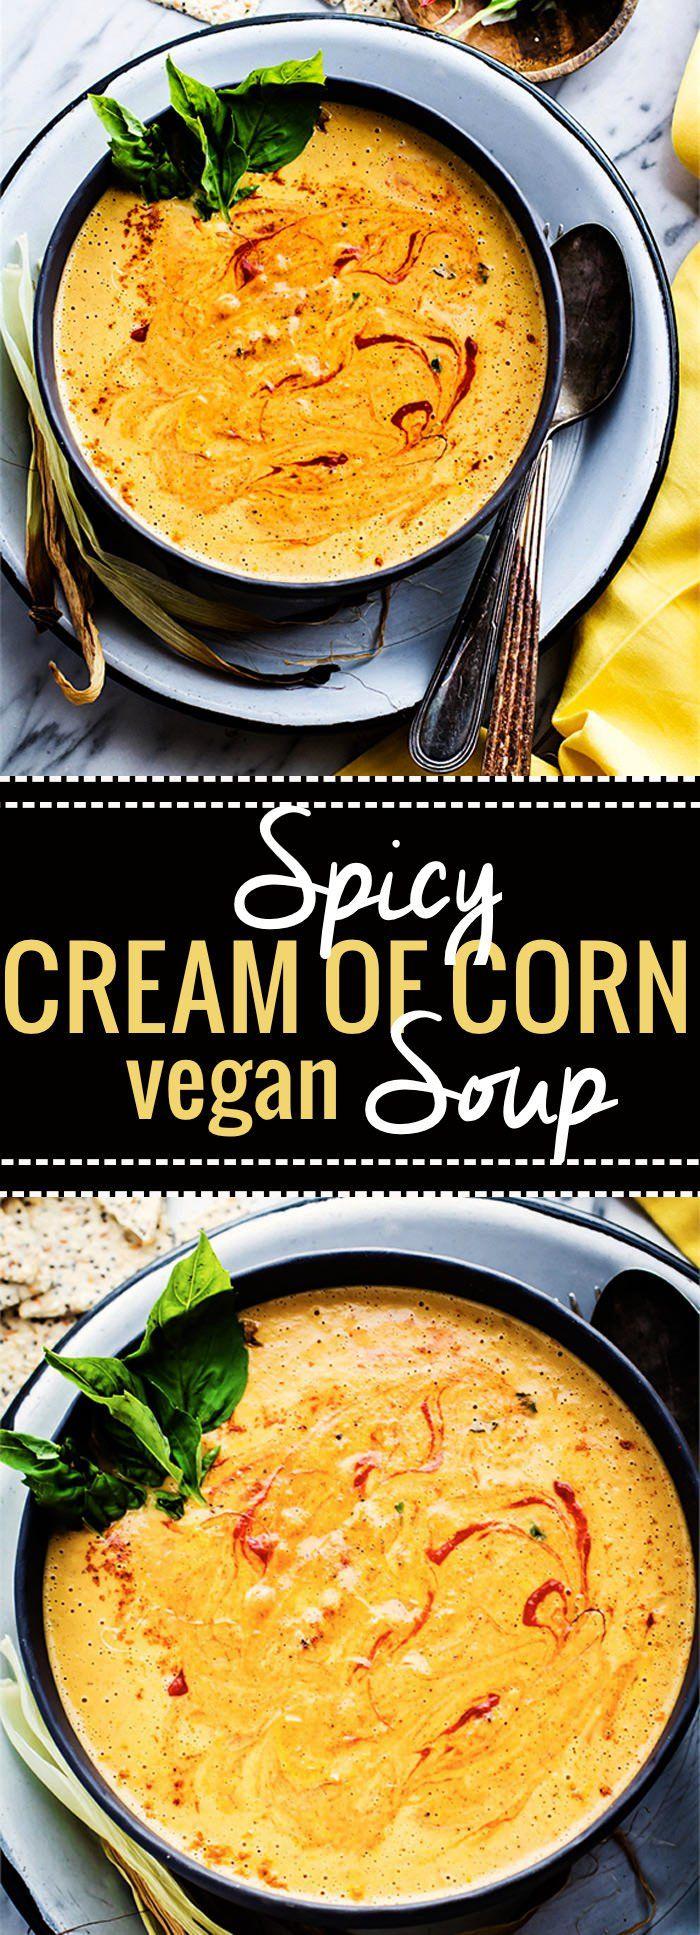 Vegan Spicy Cream of Corn Soup {Blender}